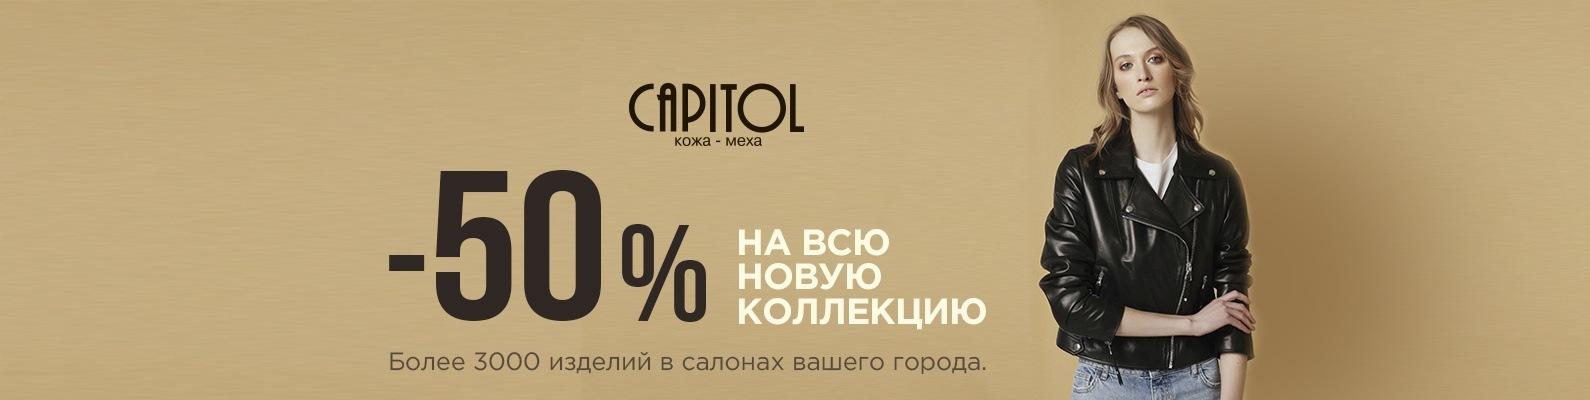 f2a090c30 Capitol (Кaпитоль) Cалон кожи и мeхa | ВКонтакте